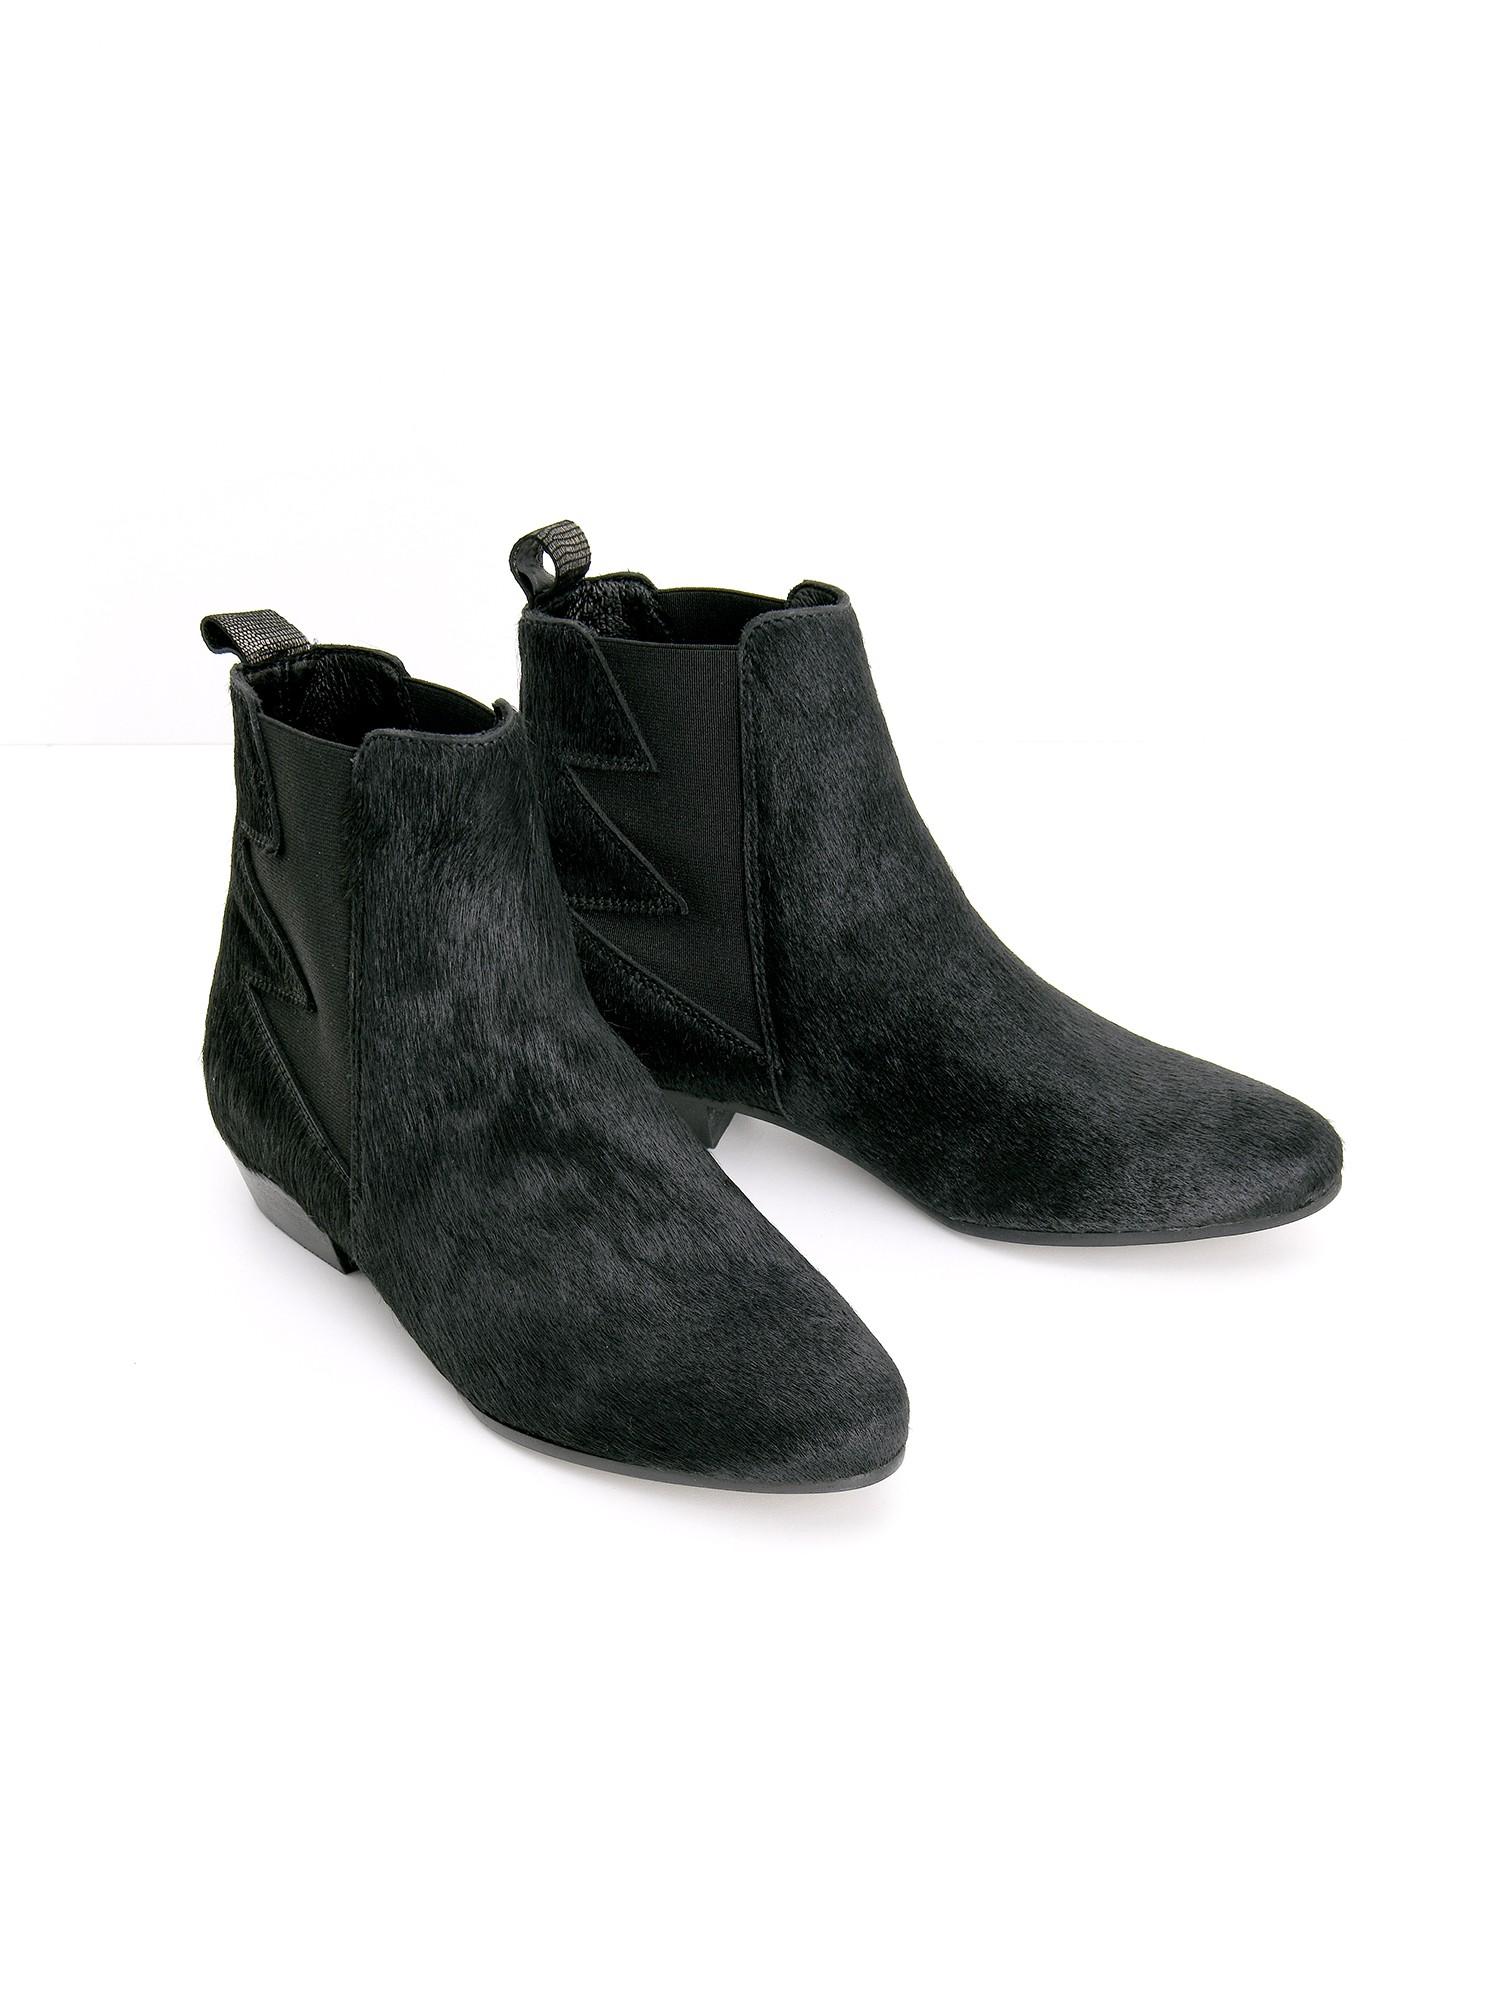 schmoove.fr PECKHAM BOOTS - PONY - BLACK